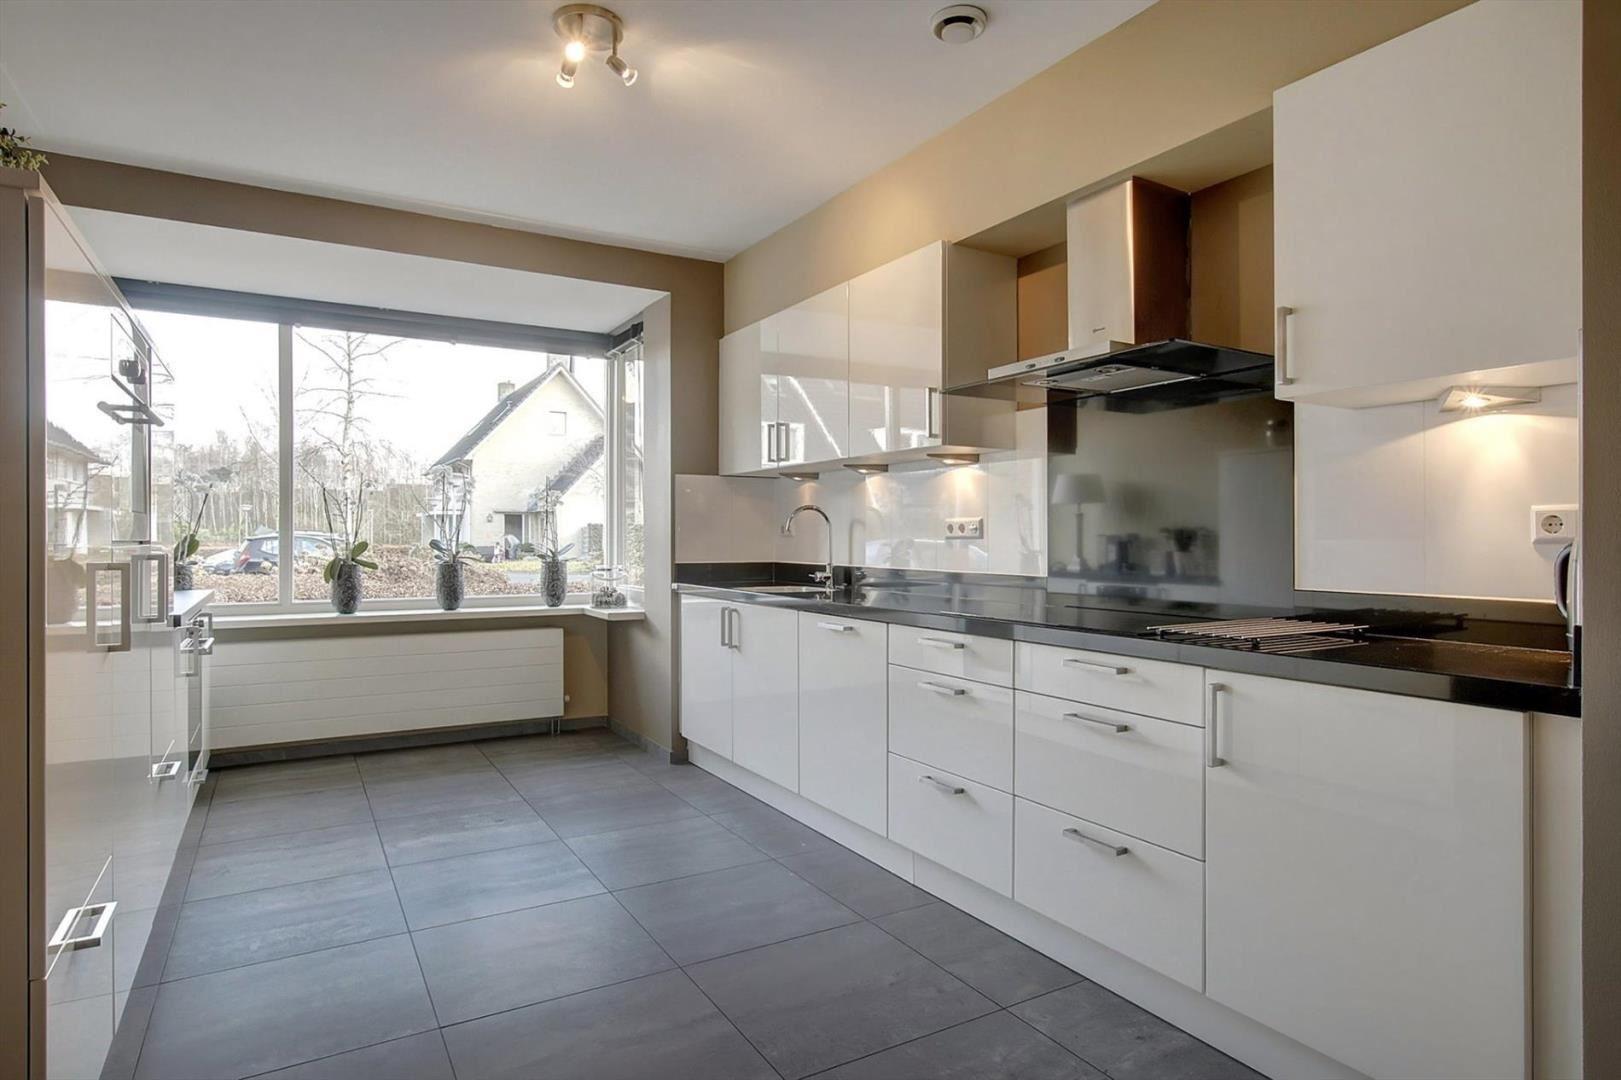 Huis te koop: Sprietzeil 78 1319 EC Almere [funda] Chagallweg 78 Almere